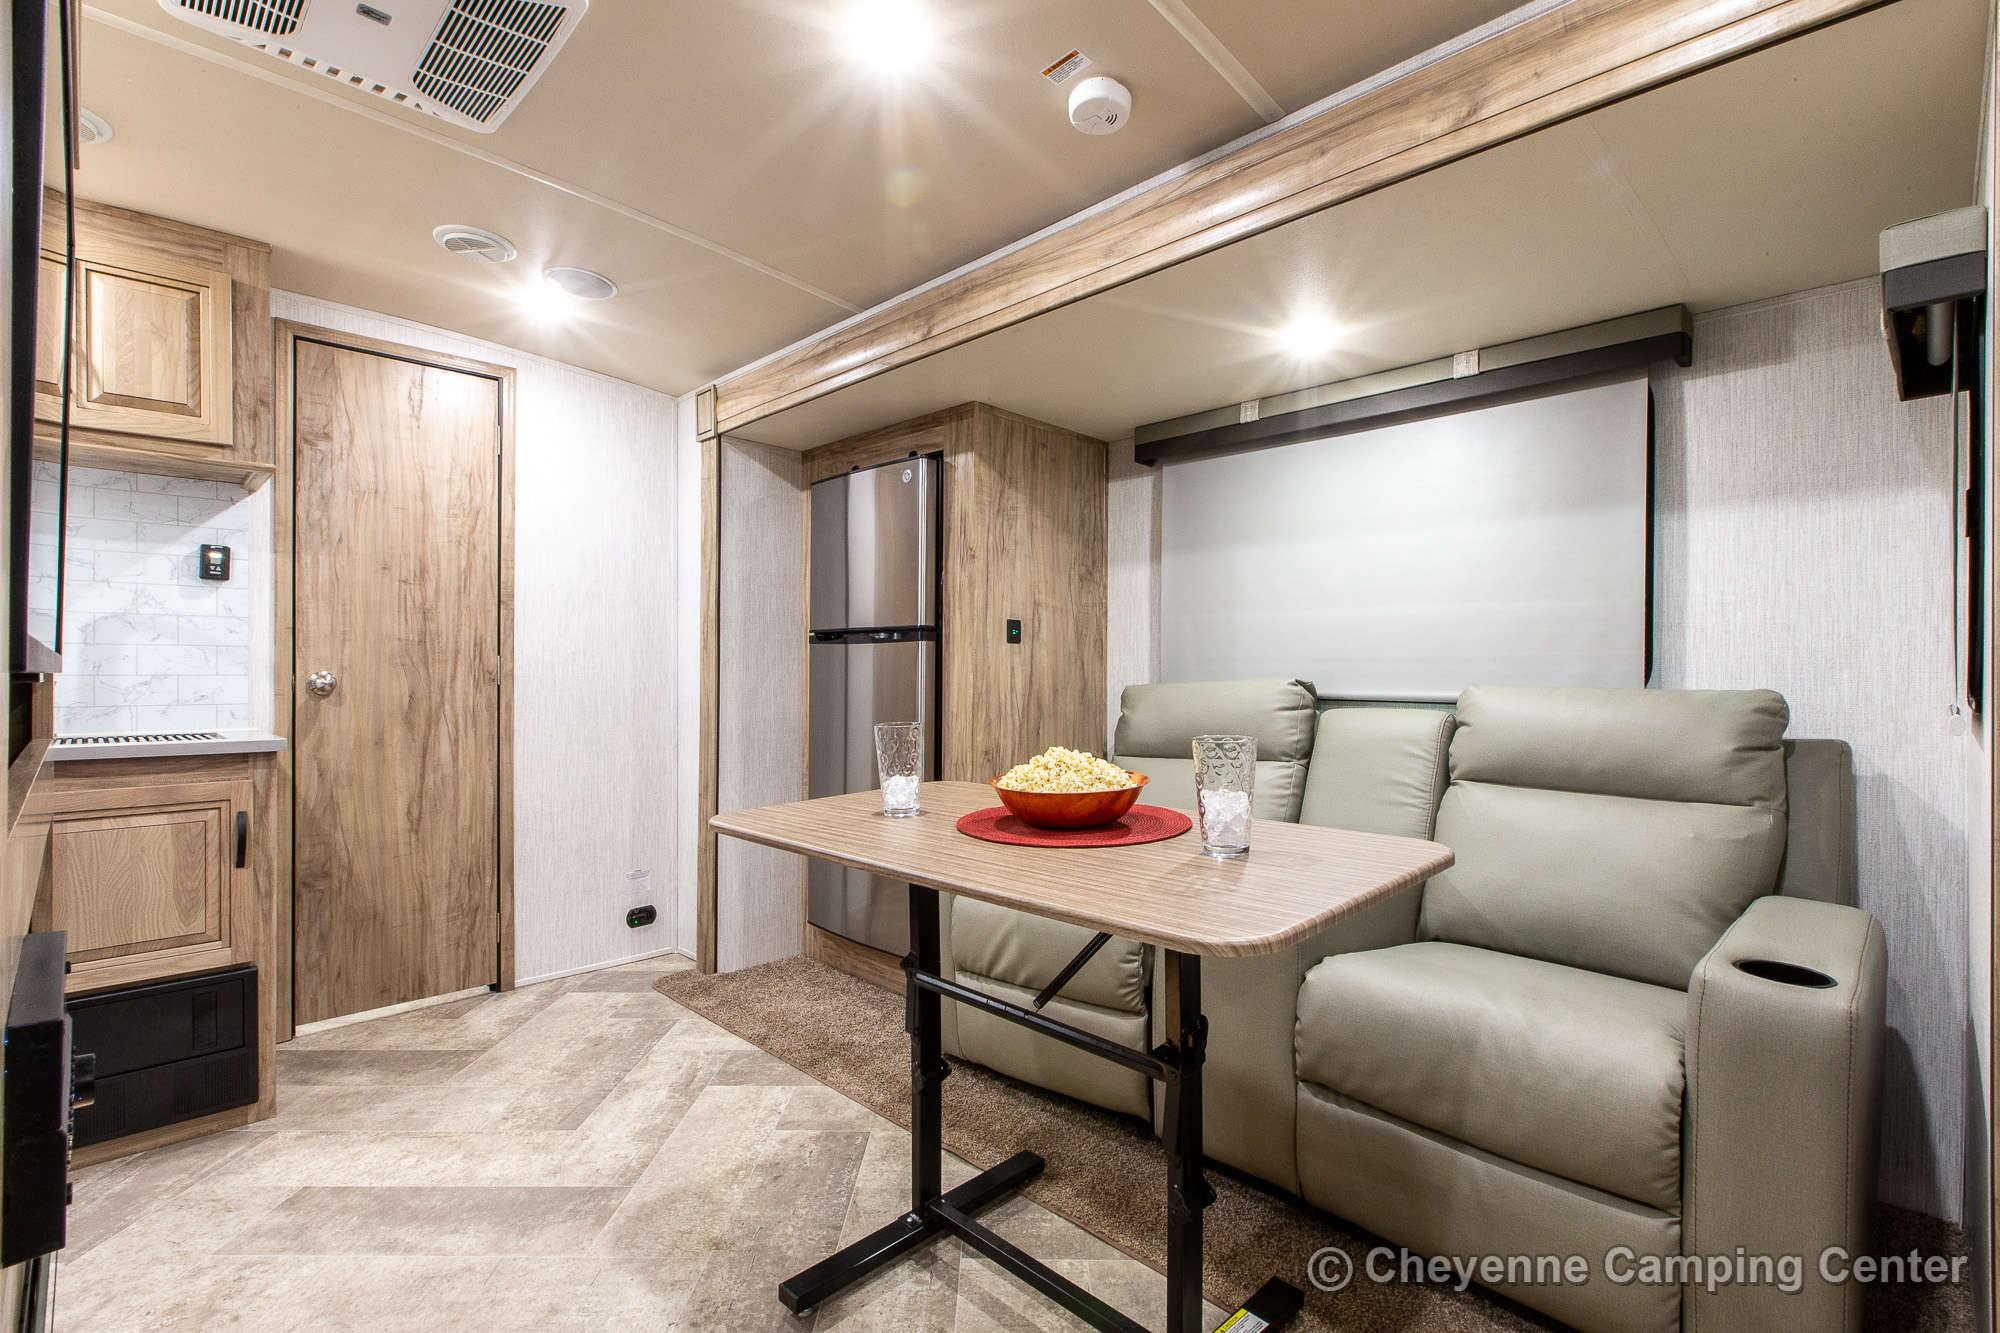 2021 Palomino SolAire Ultra Lite 242RBS Travel Trailer Interior Image